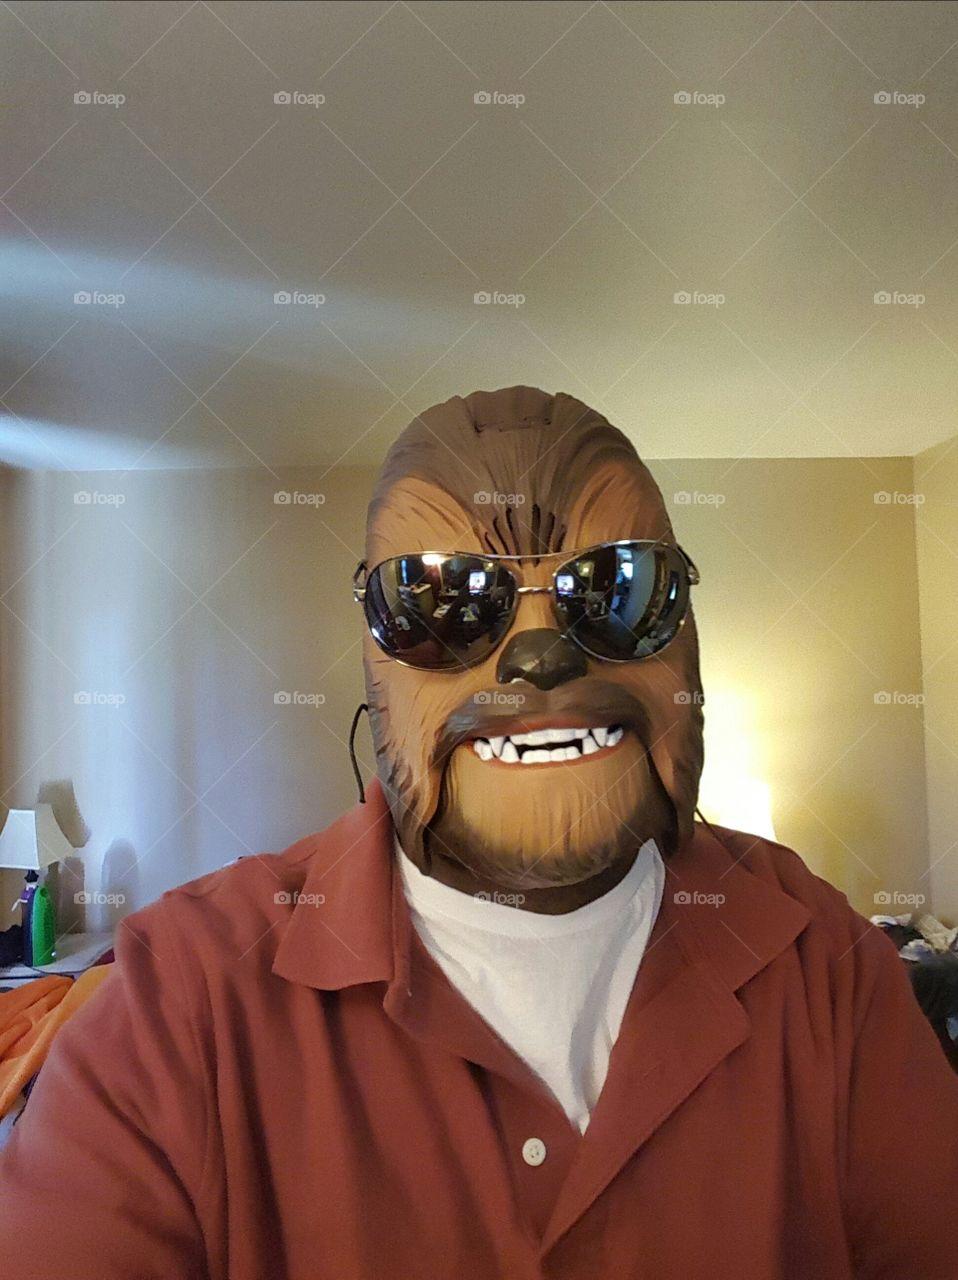 Chewbacca in shades